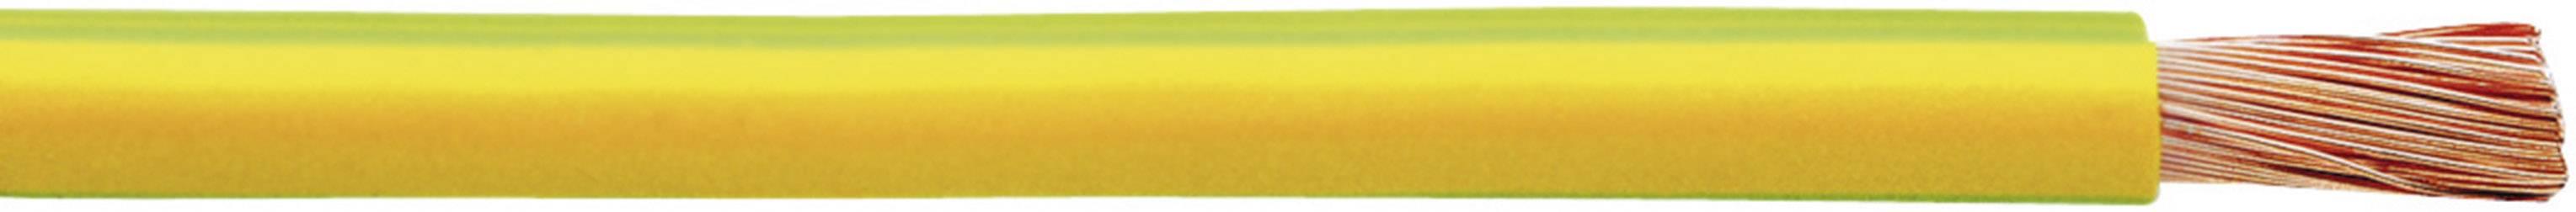 Opletenie / lanko Faber Kabel 040061 H07V-K, 1 x 25 mm², vonkajší Ø 8.50 mm, metrový tovar, čierna